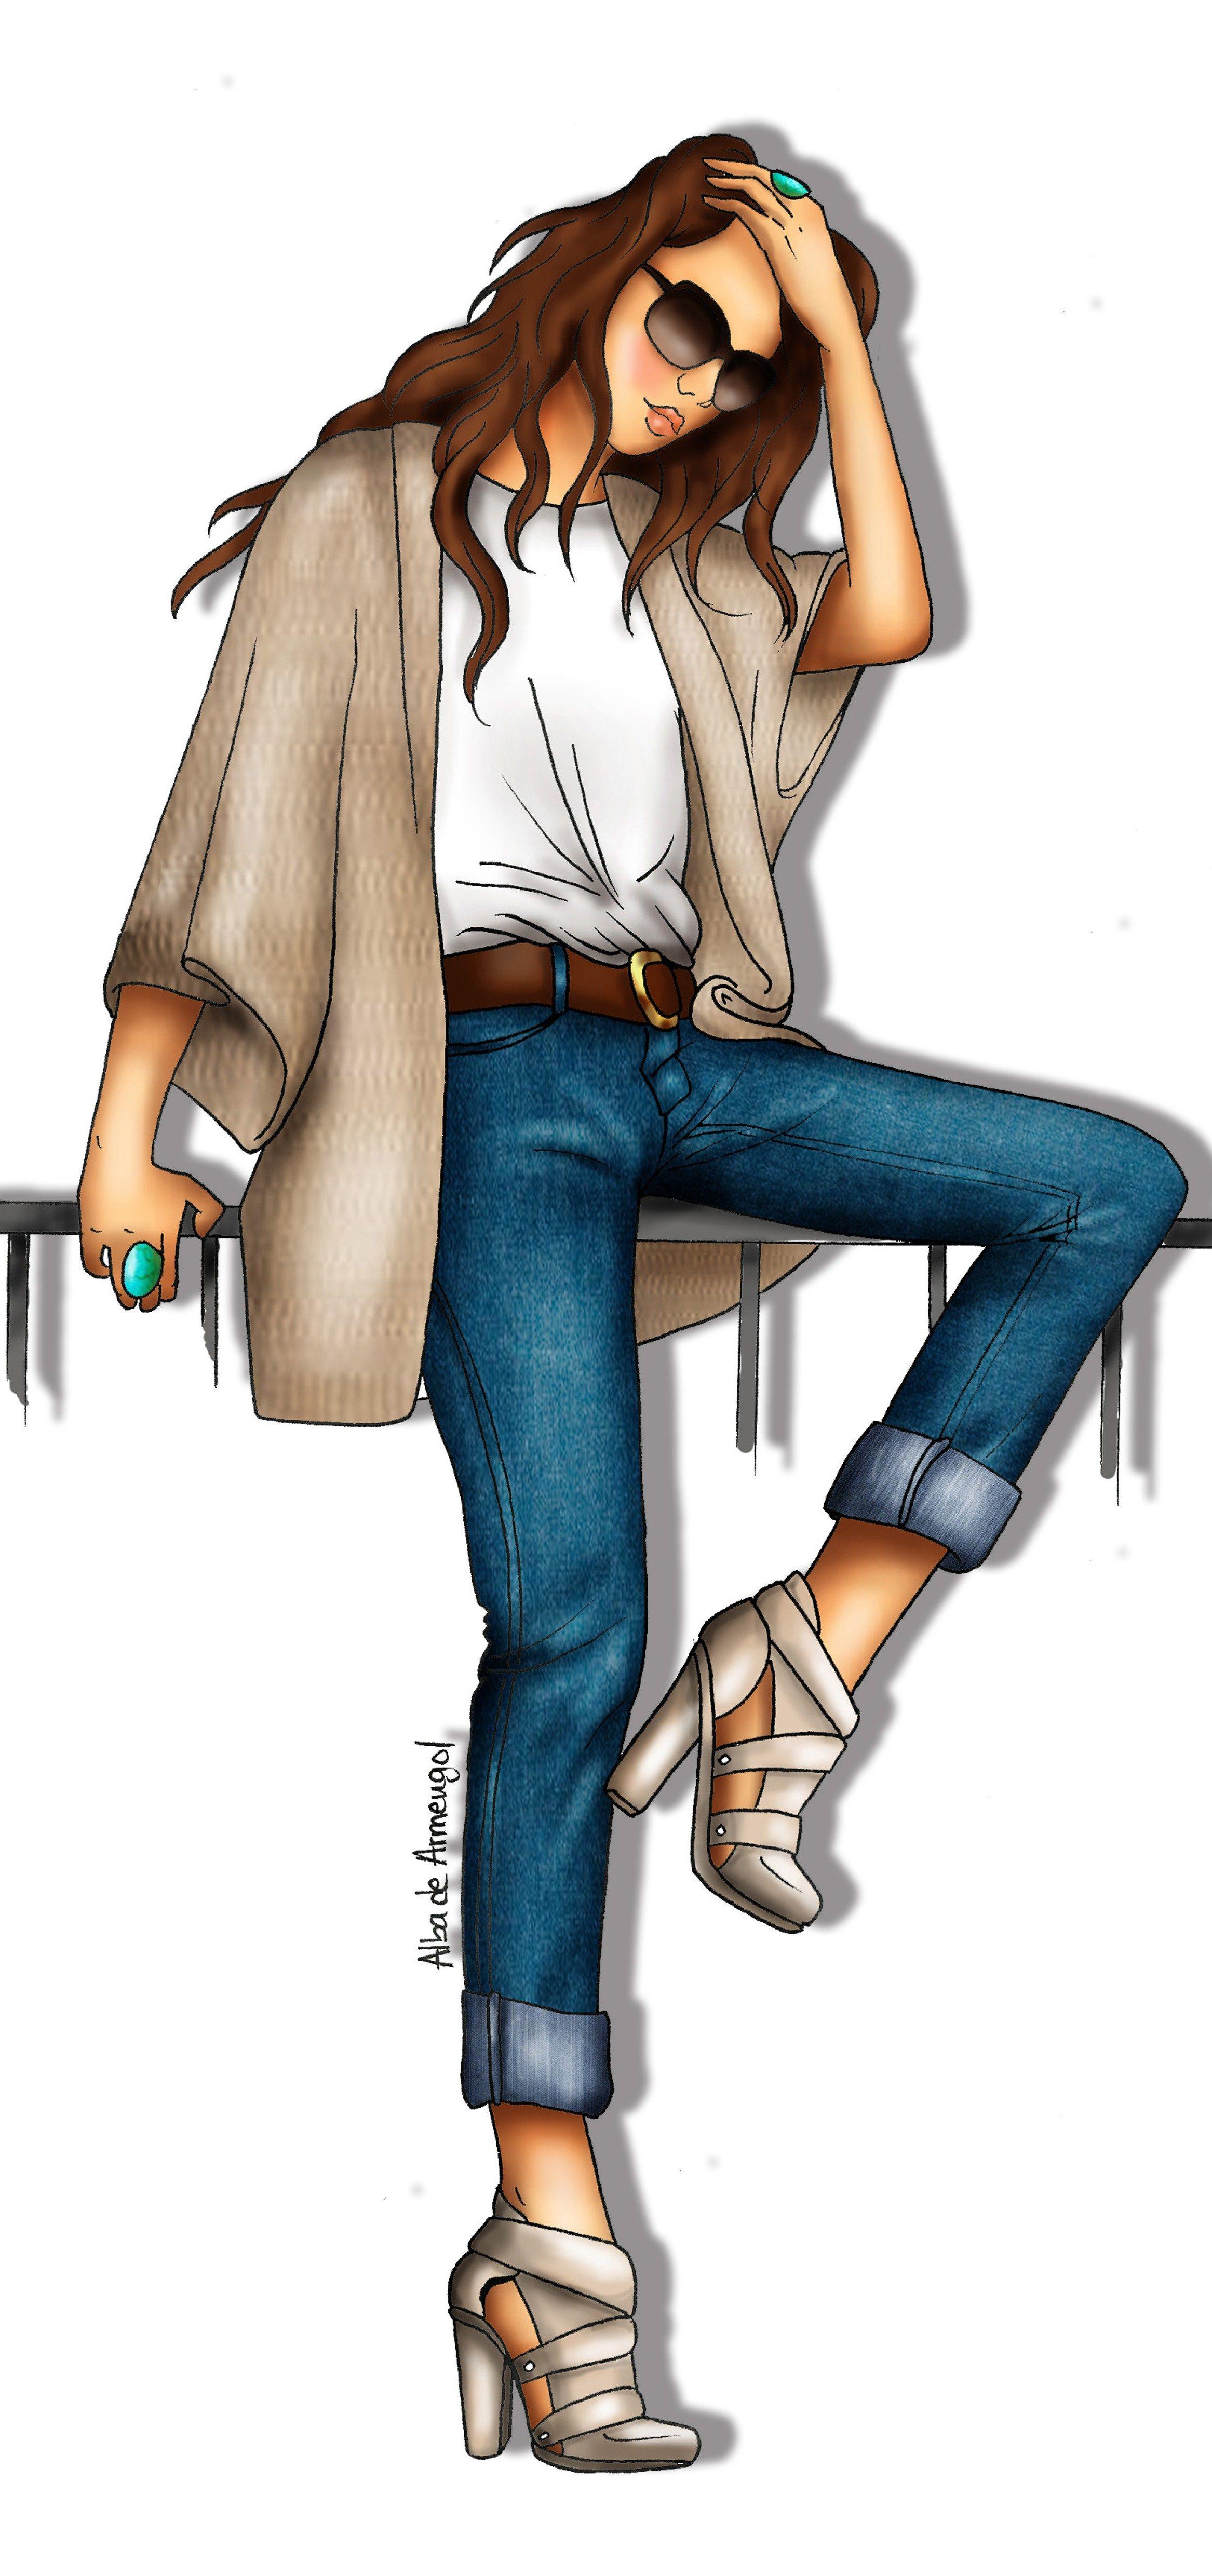 alba de armengol fashion illustration figurines   FIGURIN ...